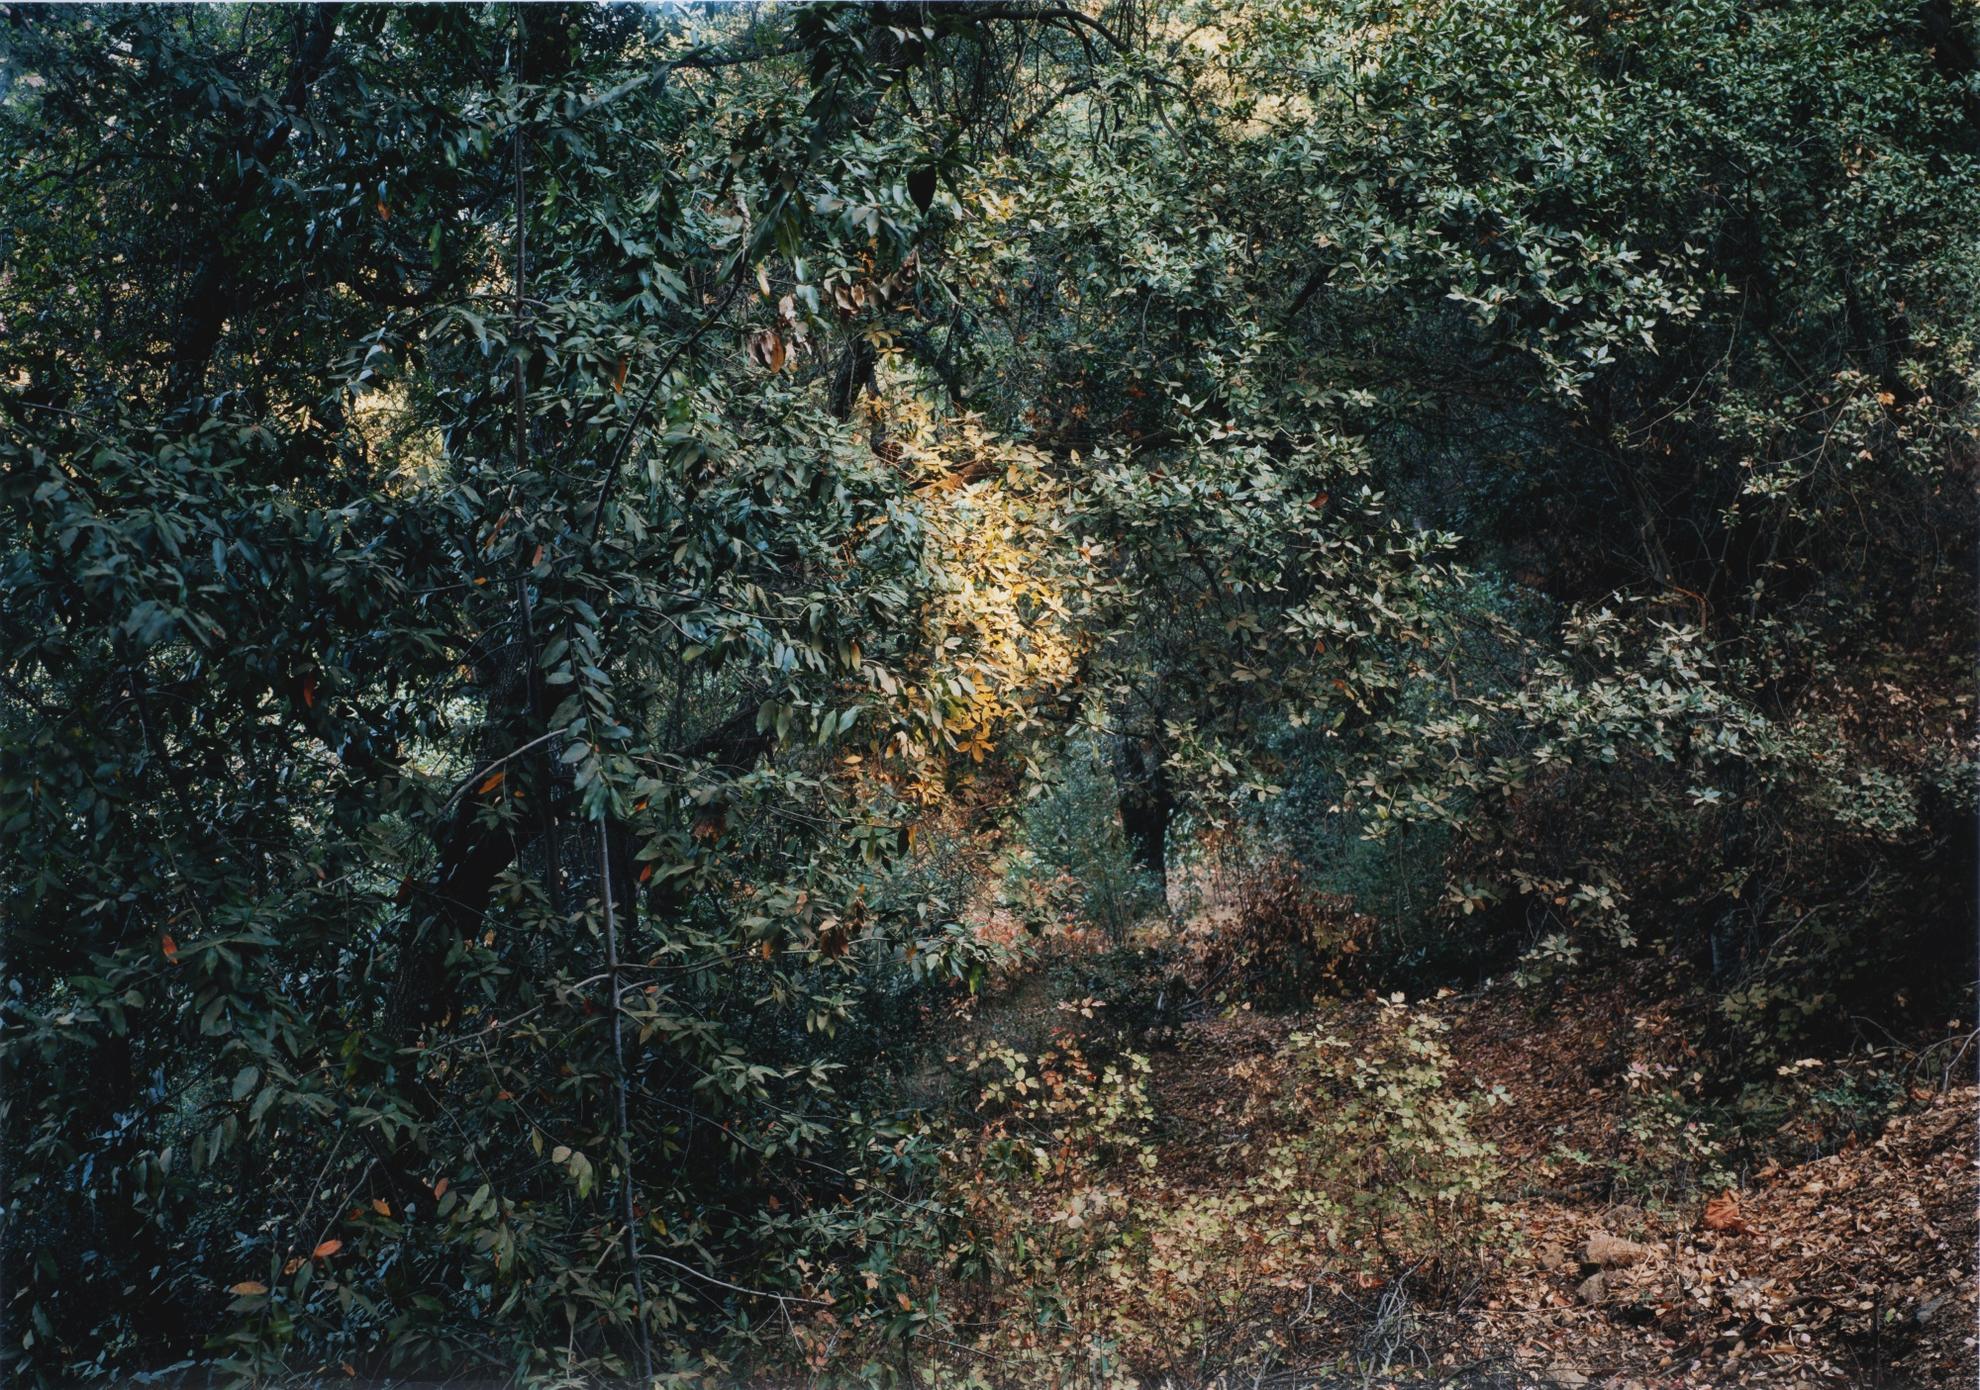 Thomas Struth-Paradise 17, California, 1999-1999